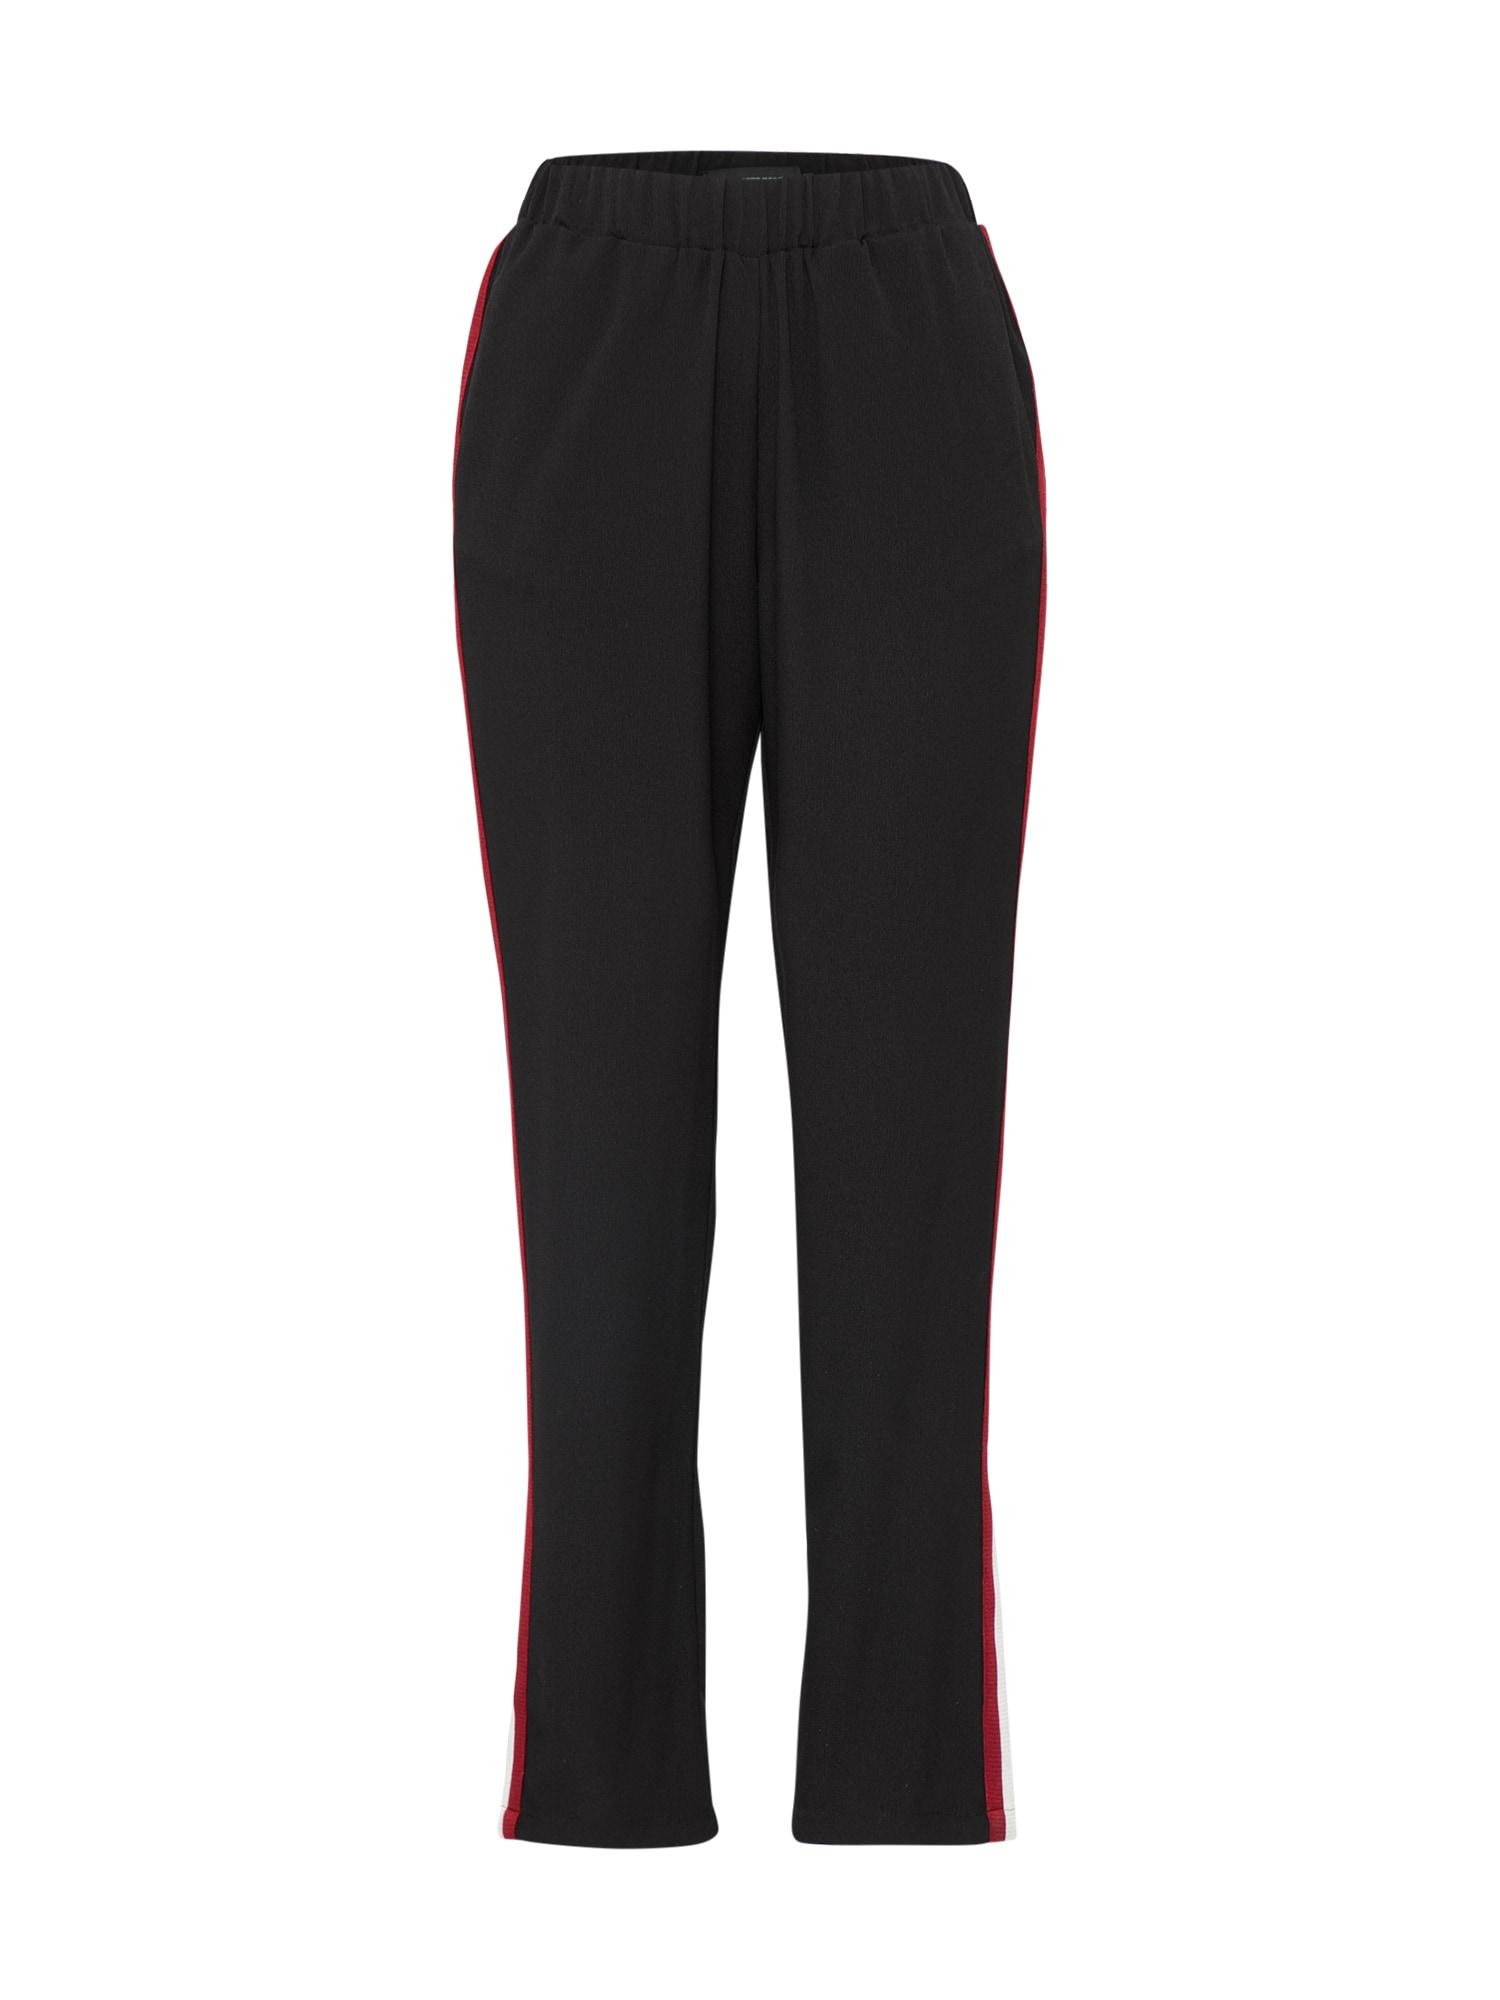 Kalhoty EMMA černá VERO MODA